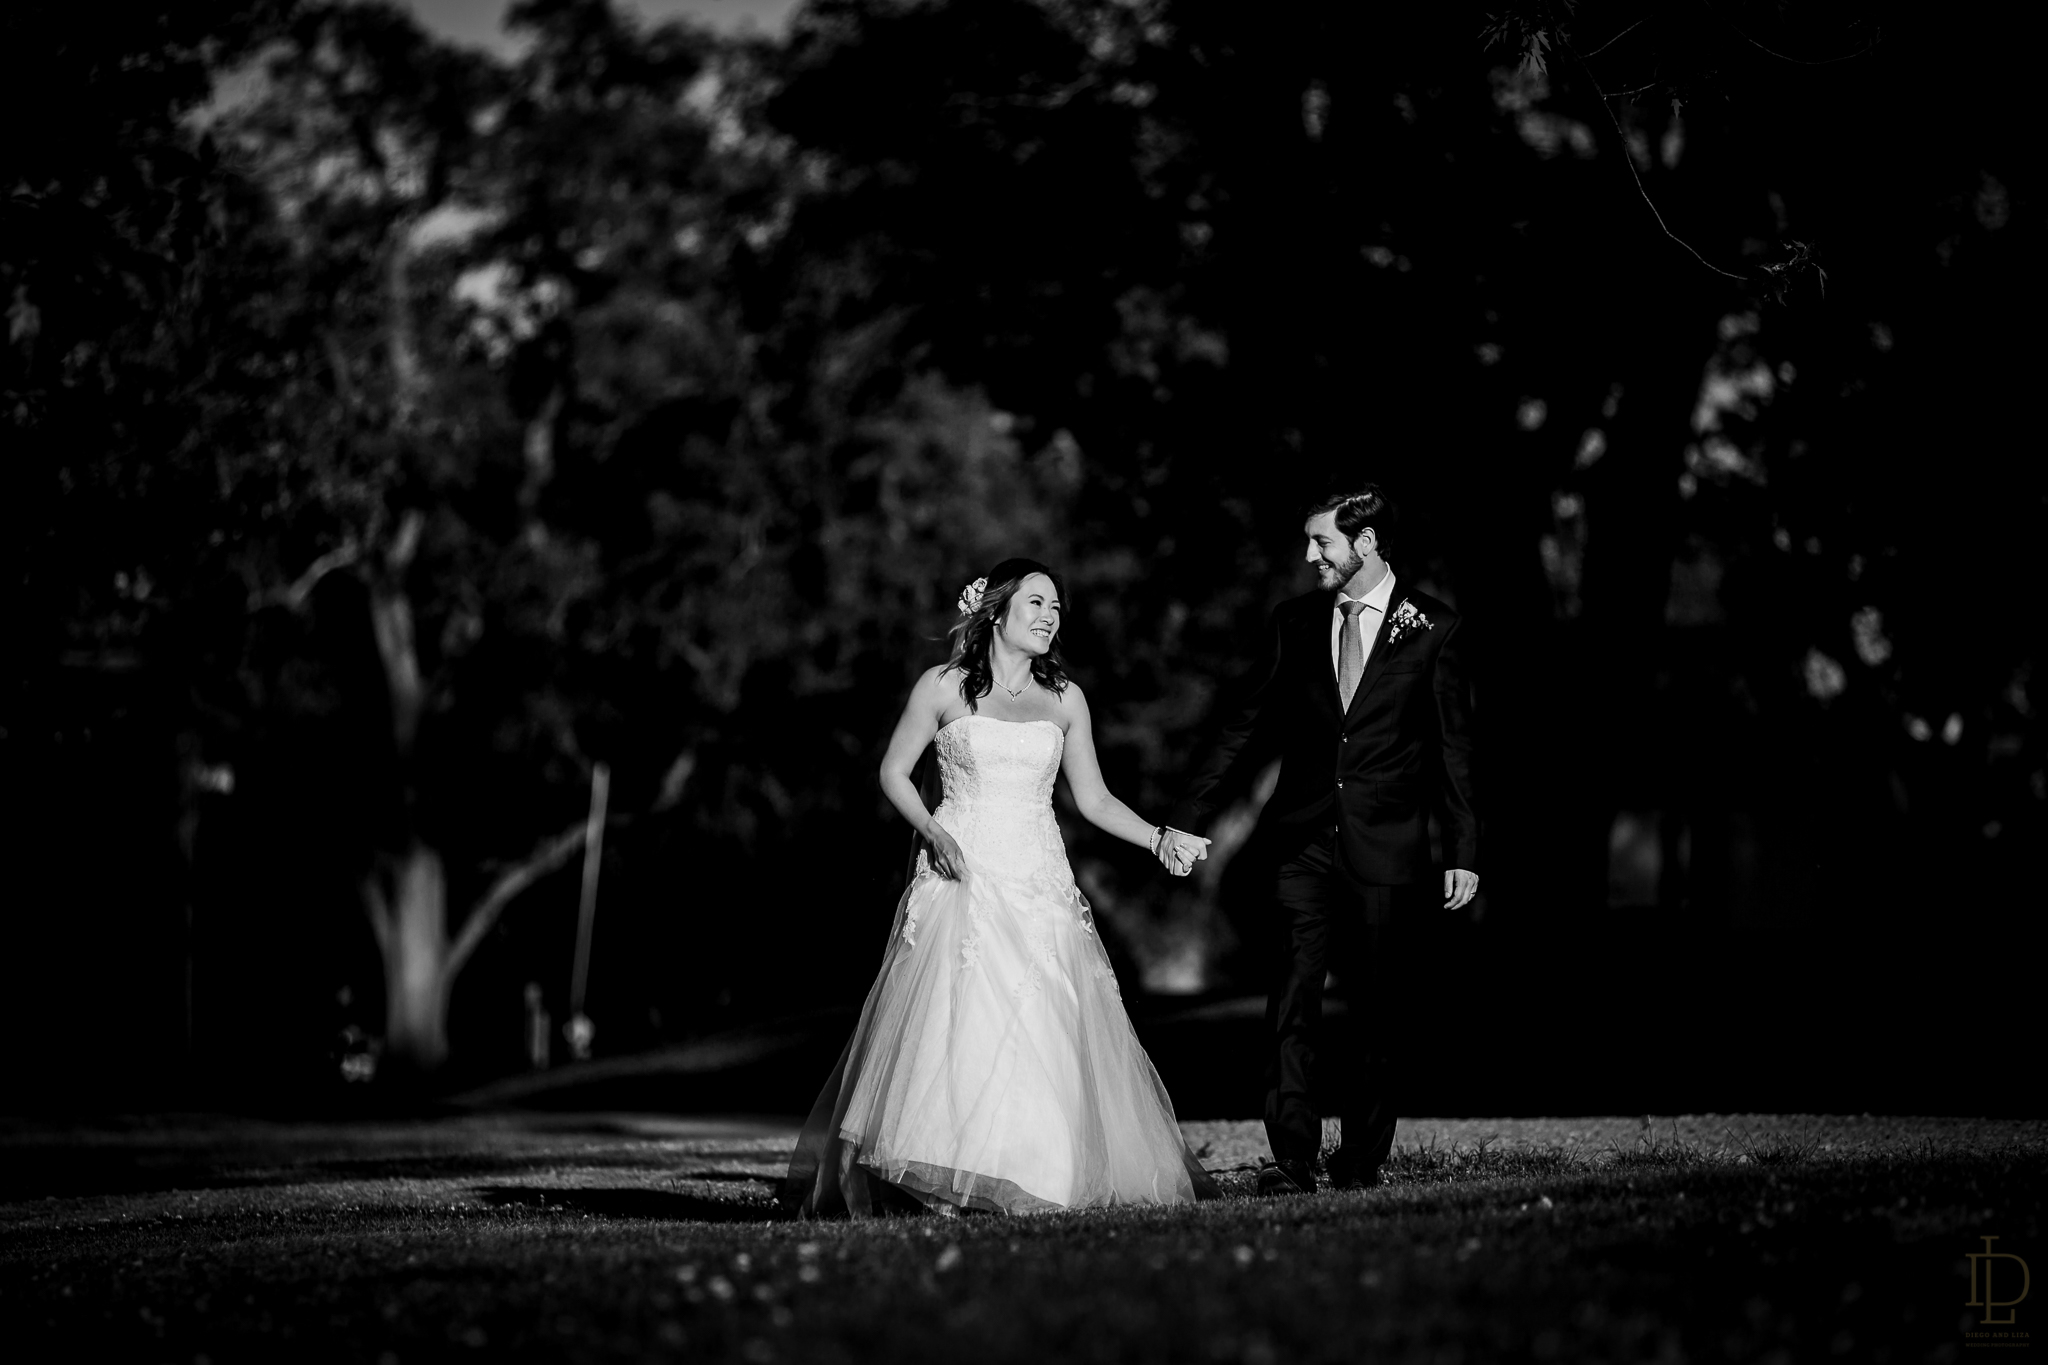 Toronto-wedding-Photograper-49.jpg